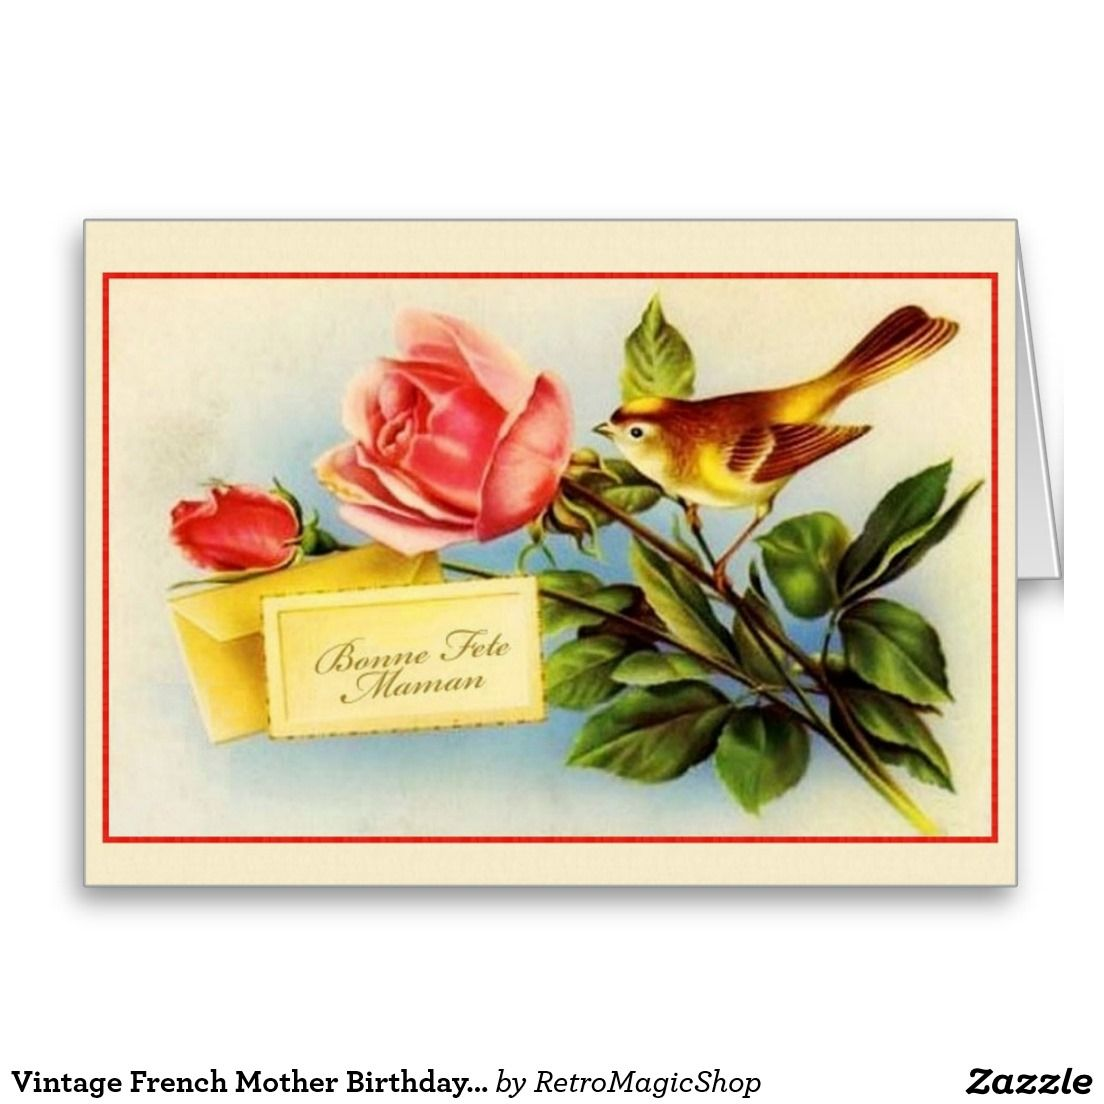 Cartao Frances Do Aniversario Da Mae Do Vintage Zazzle Com Br Birthday Greeting Cards Vintage Cards Mother Birthday